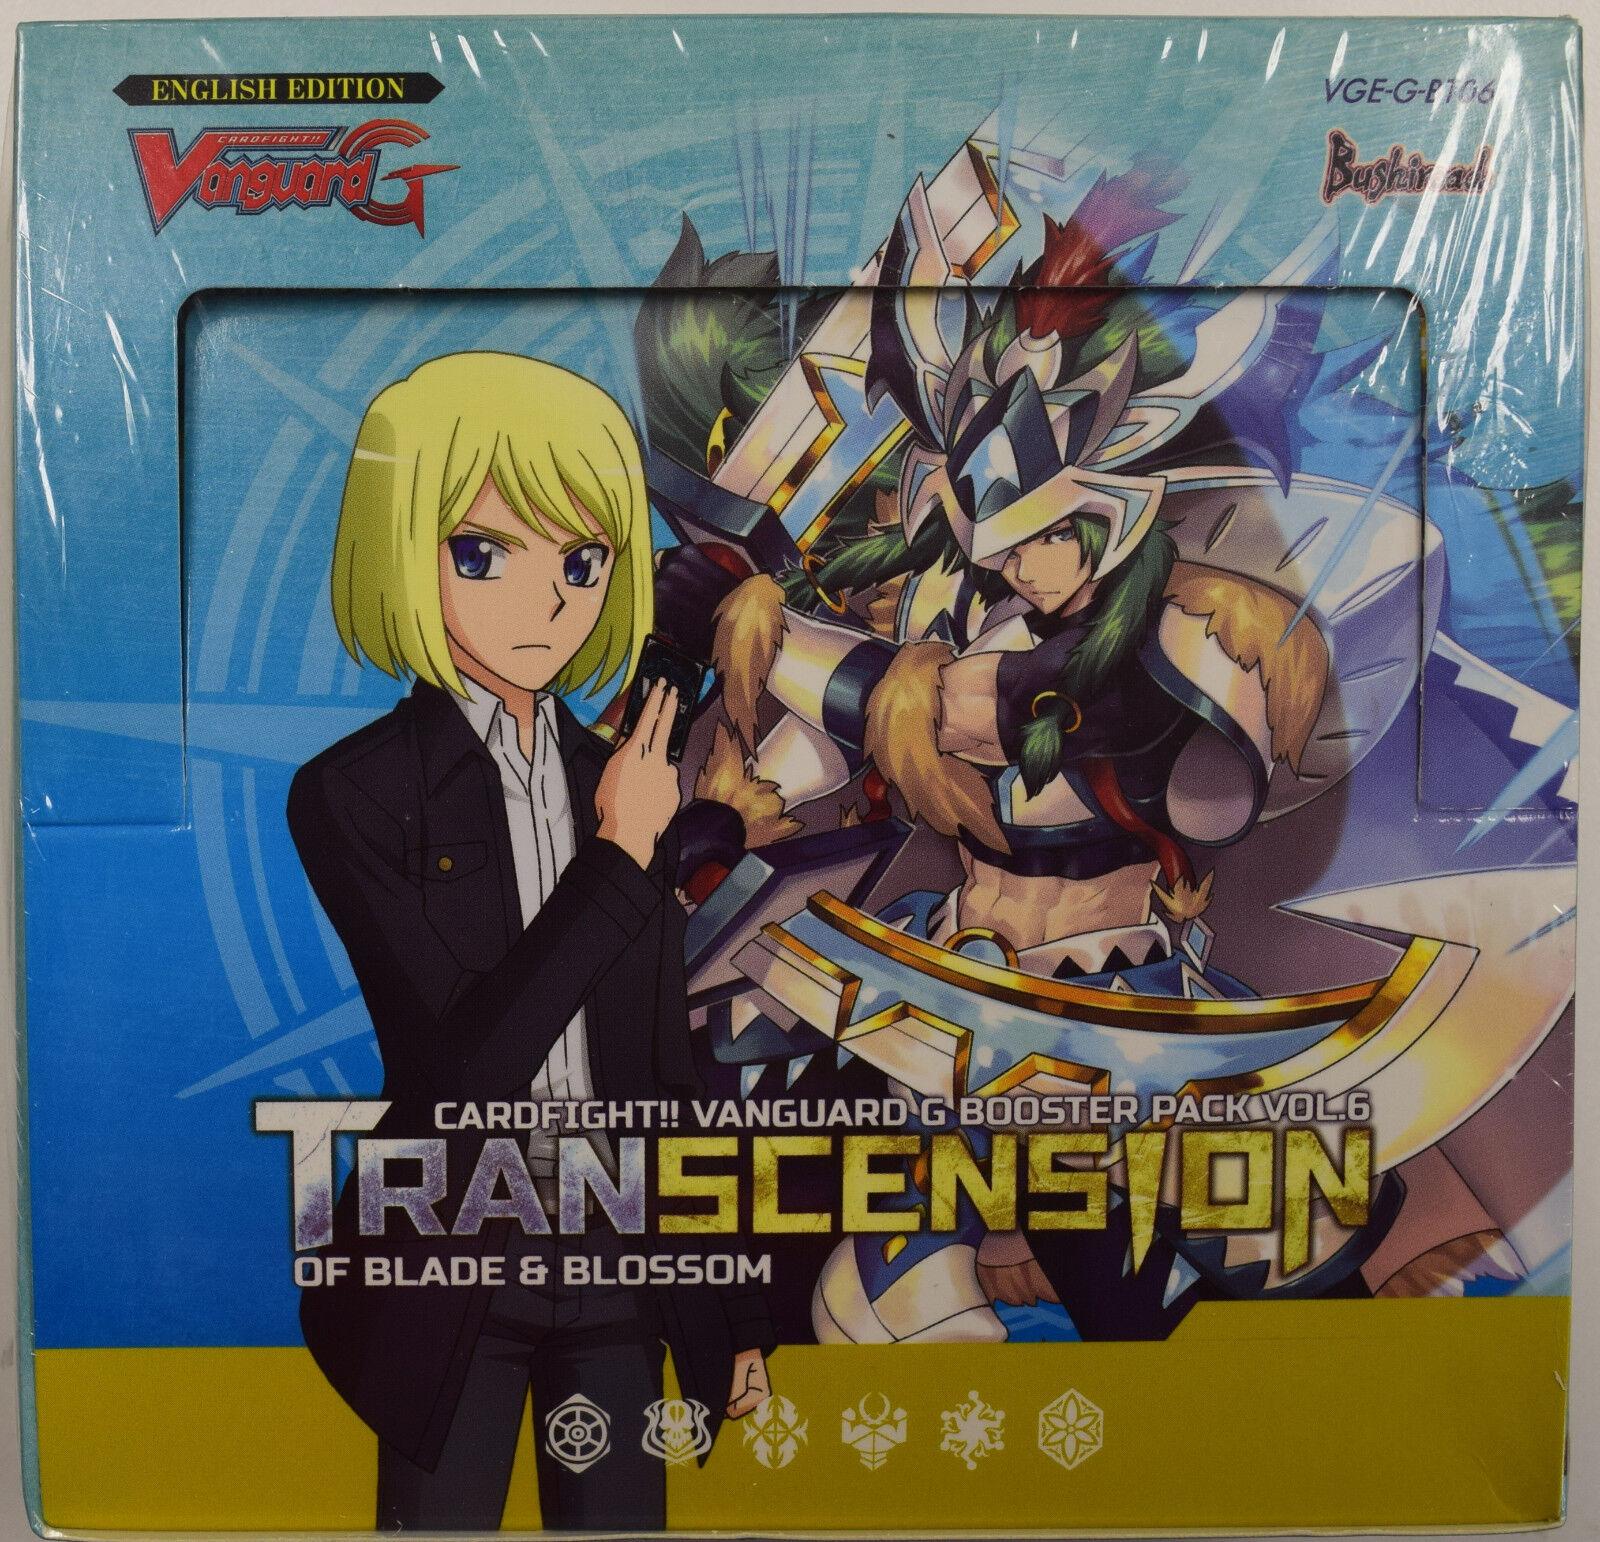 Cardfight Vanguard Transcension of Blade & Blossom Sealed Booster Box VGE-G-BT06